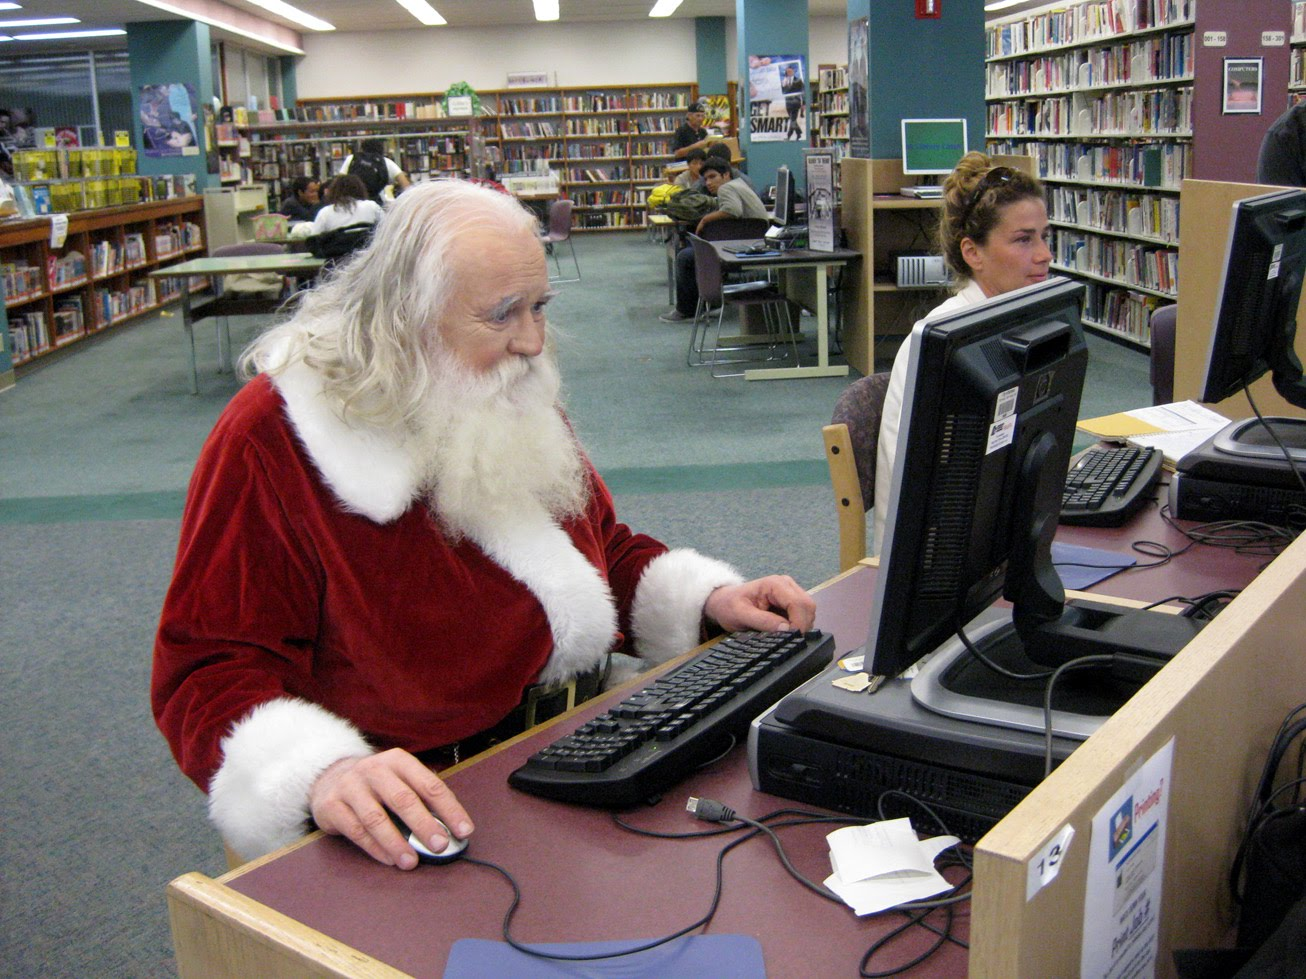 http://2.bp.blogspot.com/_8rEi362Uvfw/TJvZgoWGo8I/AAAAAAAAAG4/aVW0Hv6RVAI/s1600/Santa+on+computer.jpg